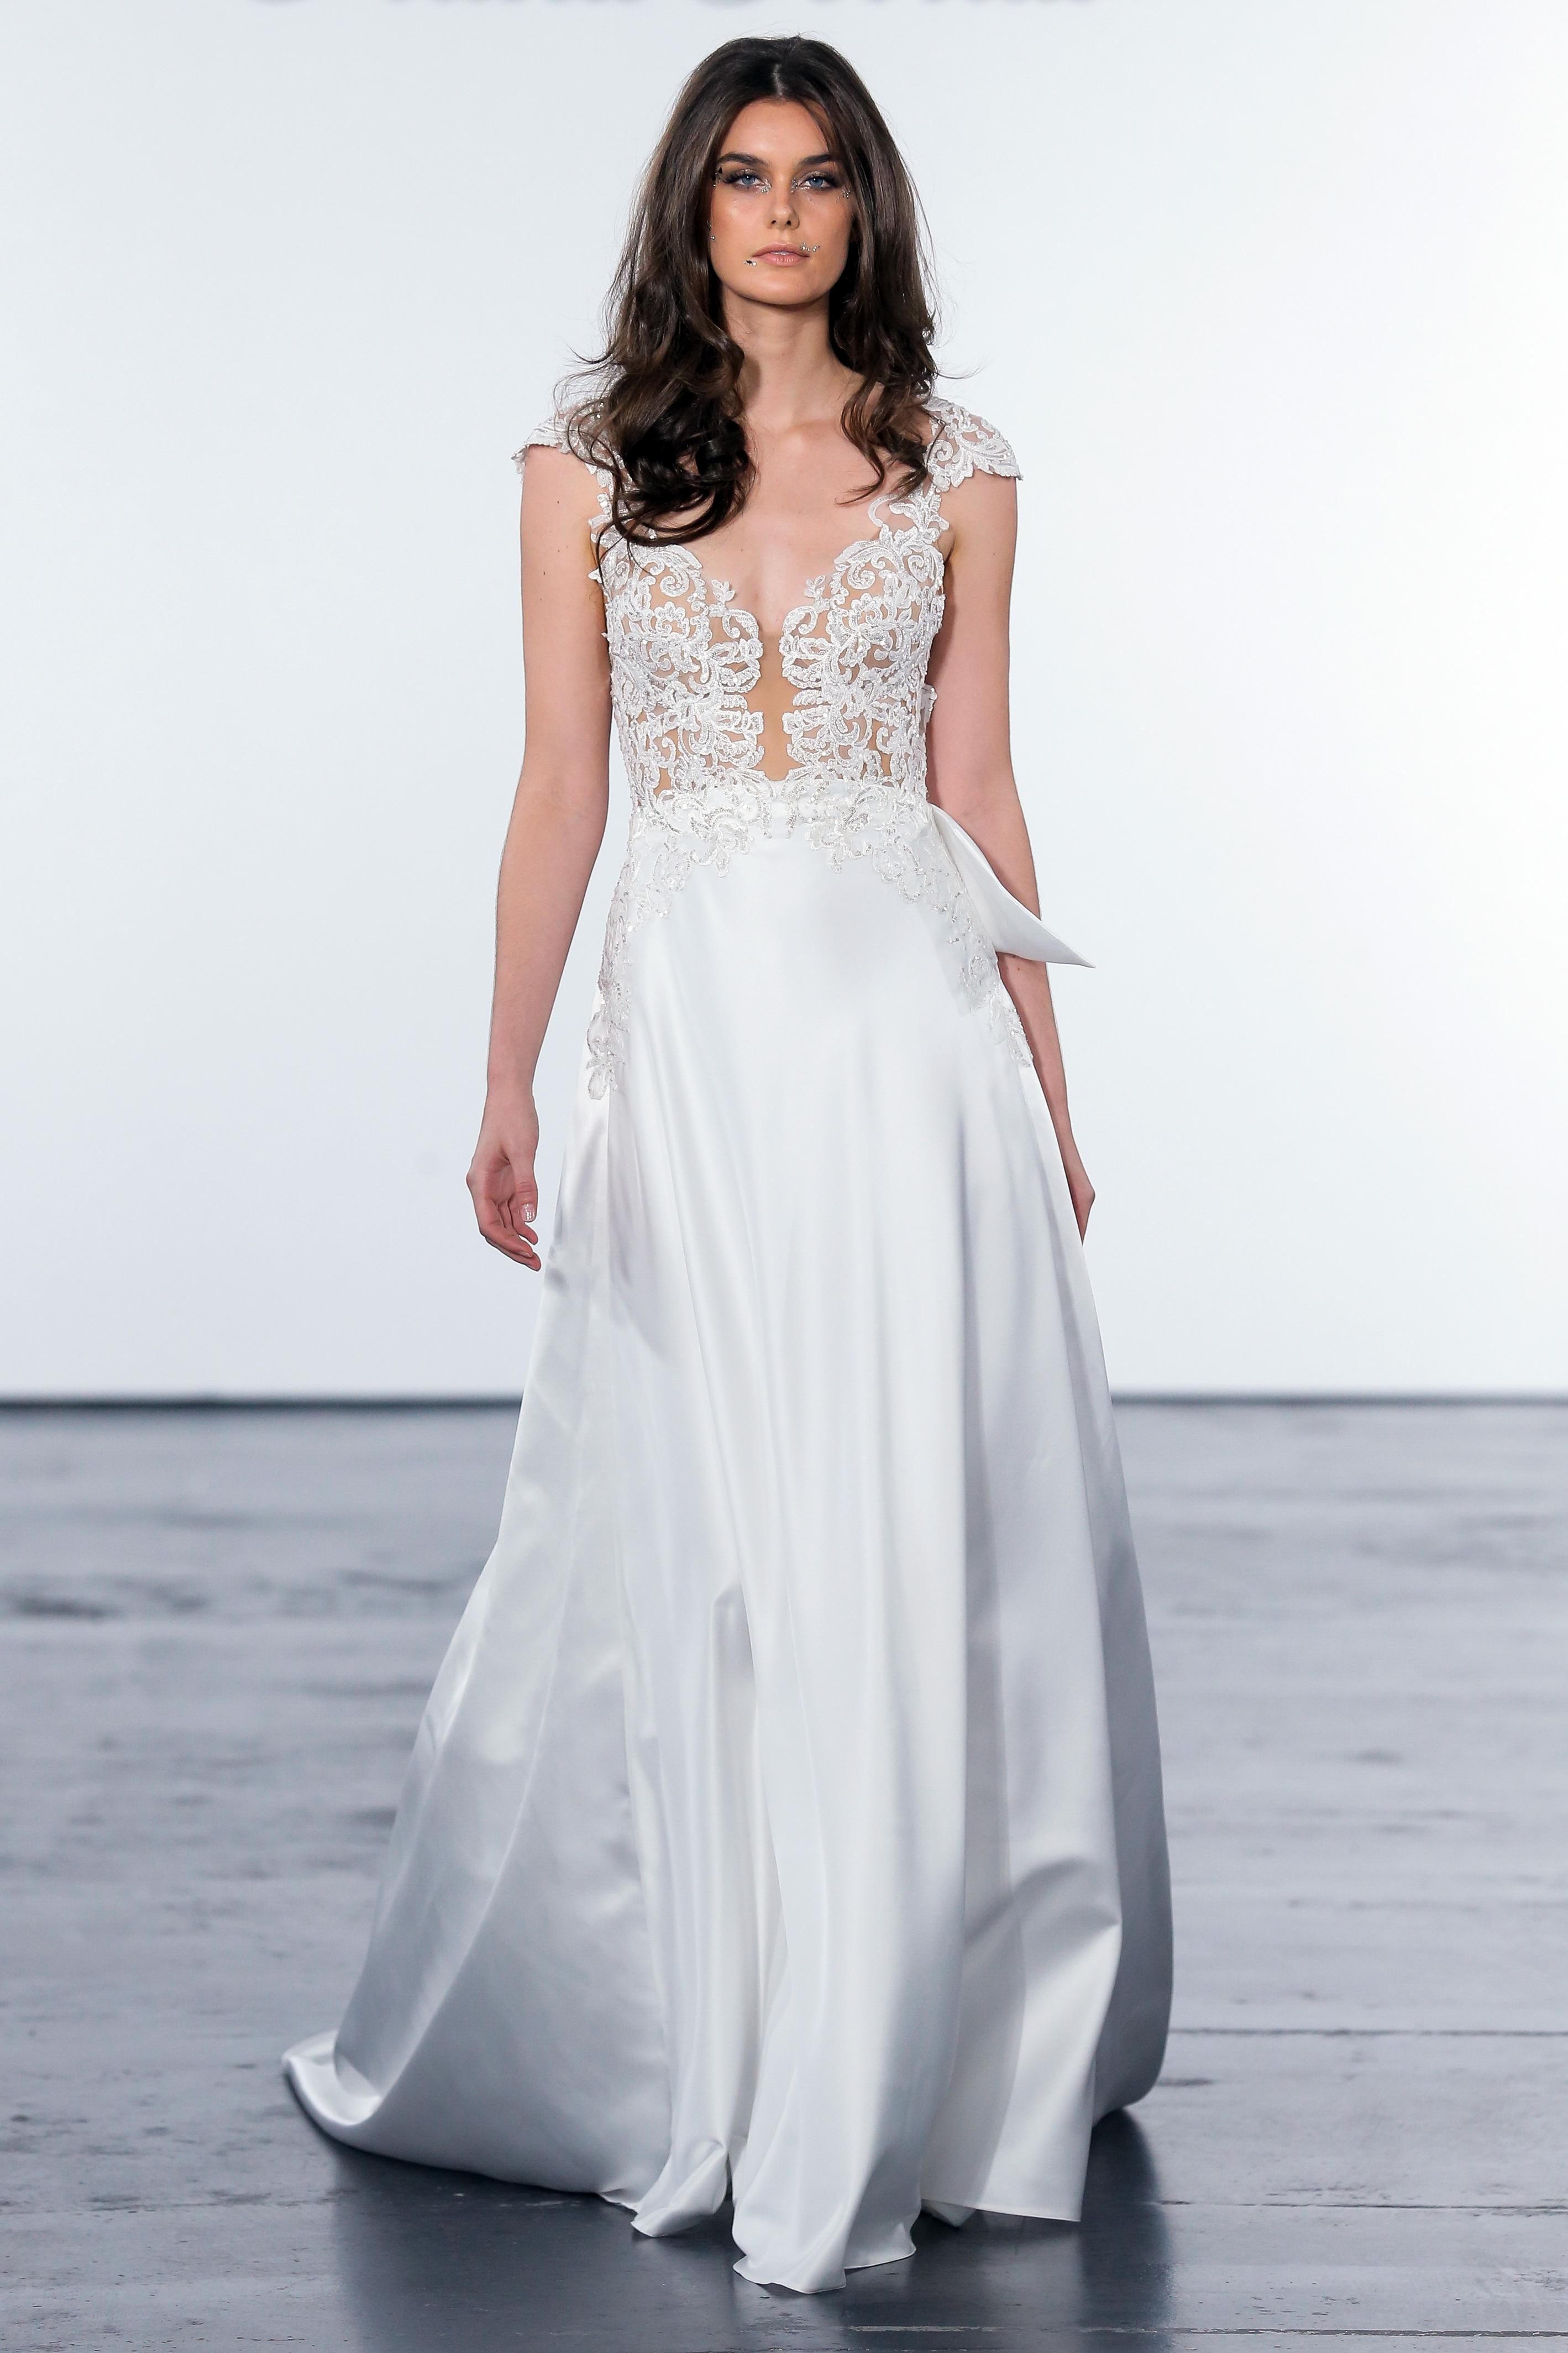 pnina tornai fall 2018 a-line lace bodice wedding ballgown